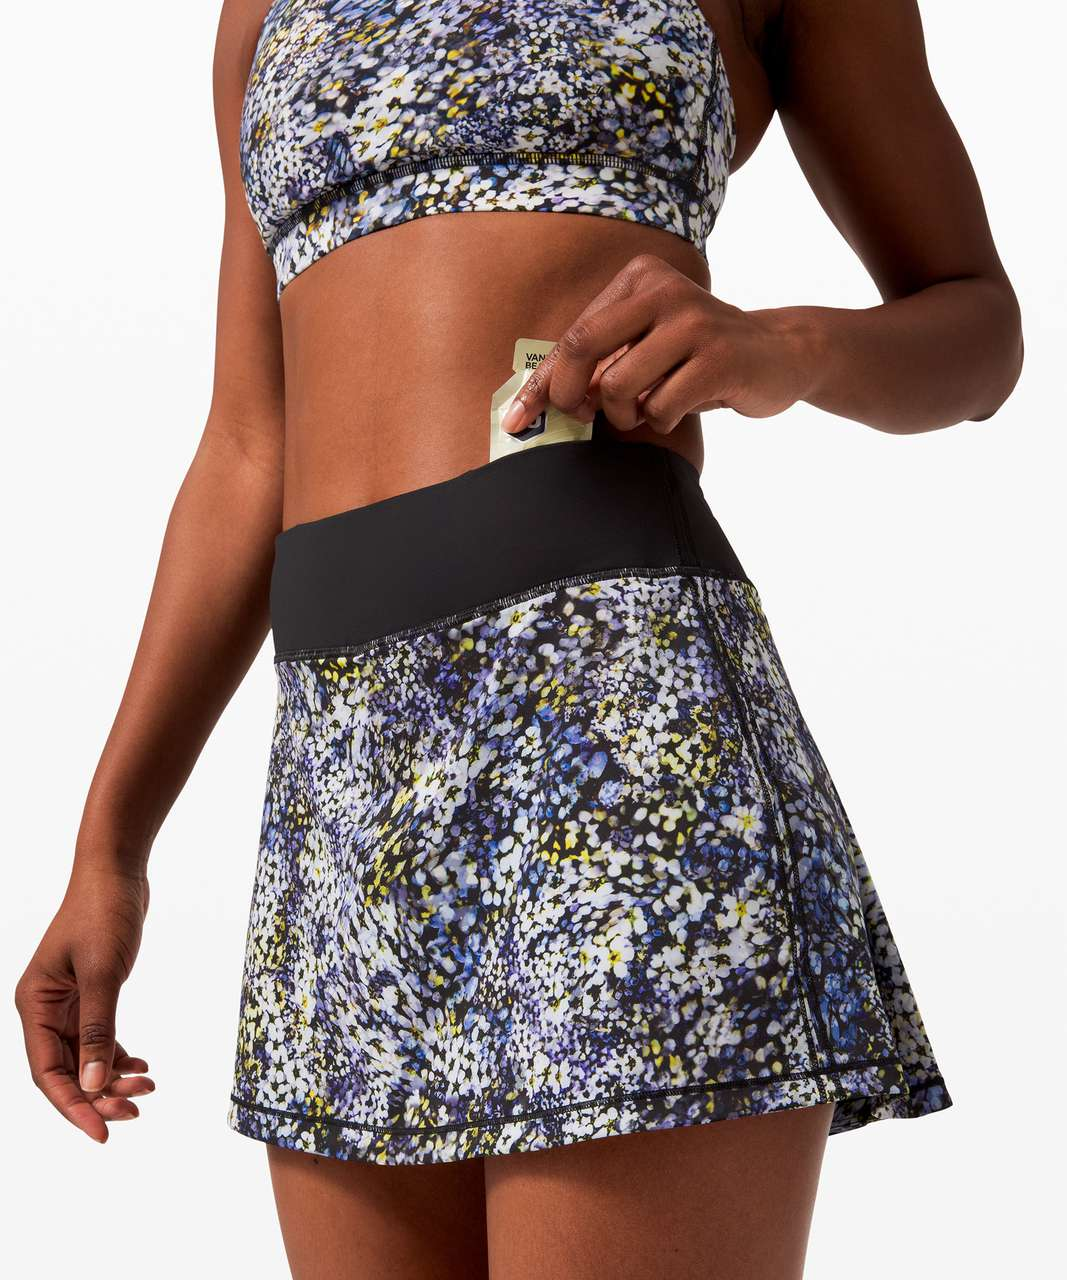 "Lululemon Pace Rival Skirt (Tall) *No Panels 15"" - Floral Metropolis Multi / Black"